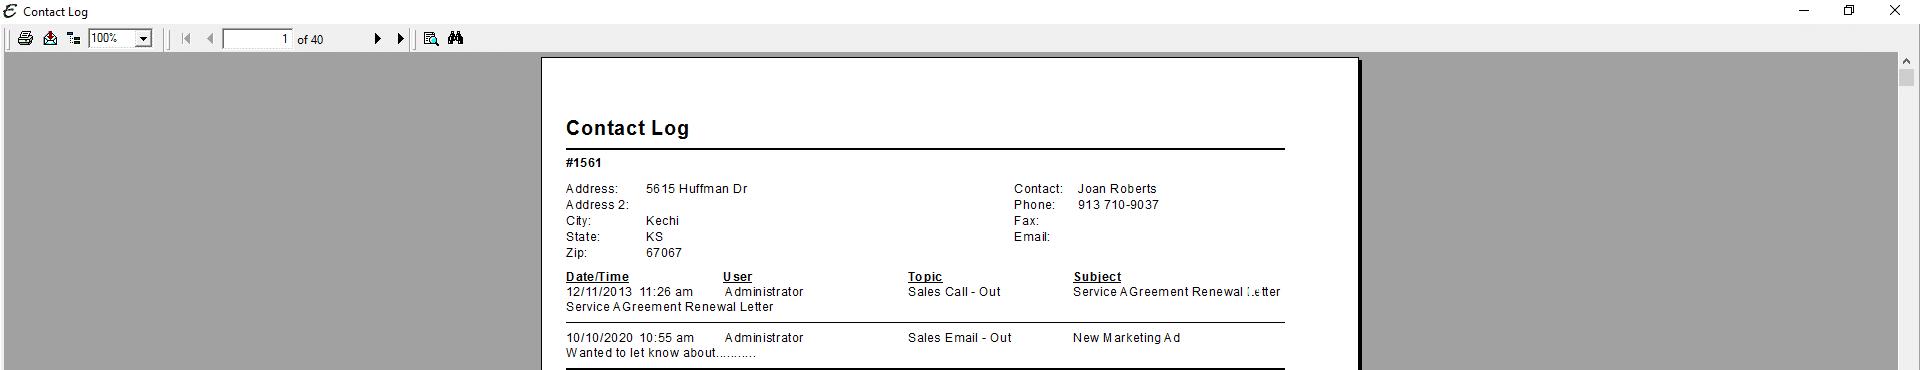 Customer Contact Log PDF